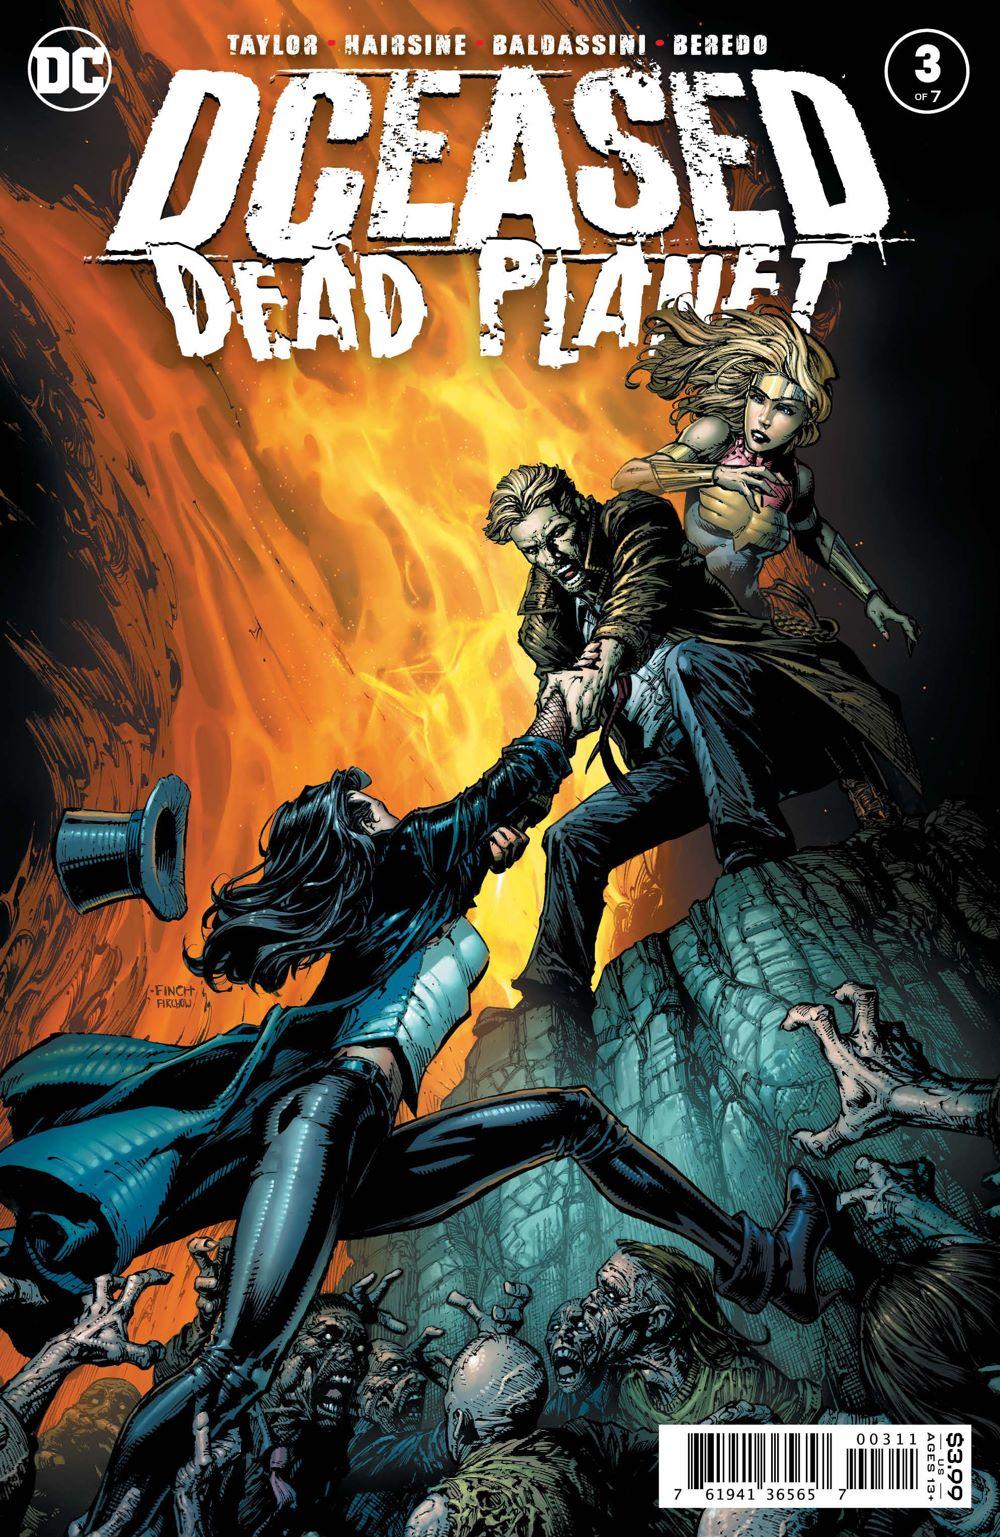 DCeased-DeadPlanet-Cv3 ComicList Previews: DCEASED DEAD PLANET #3